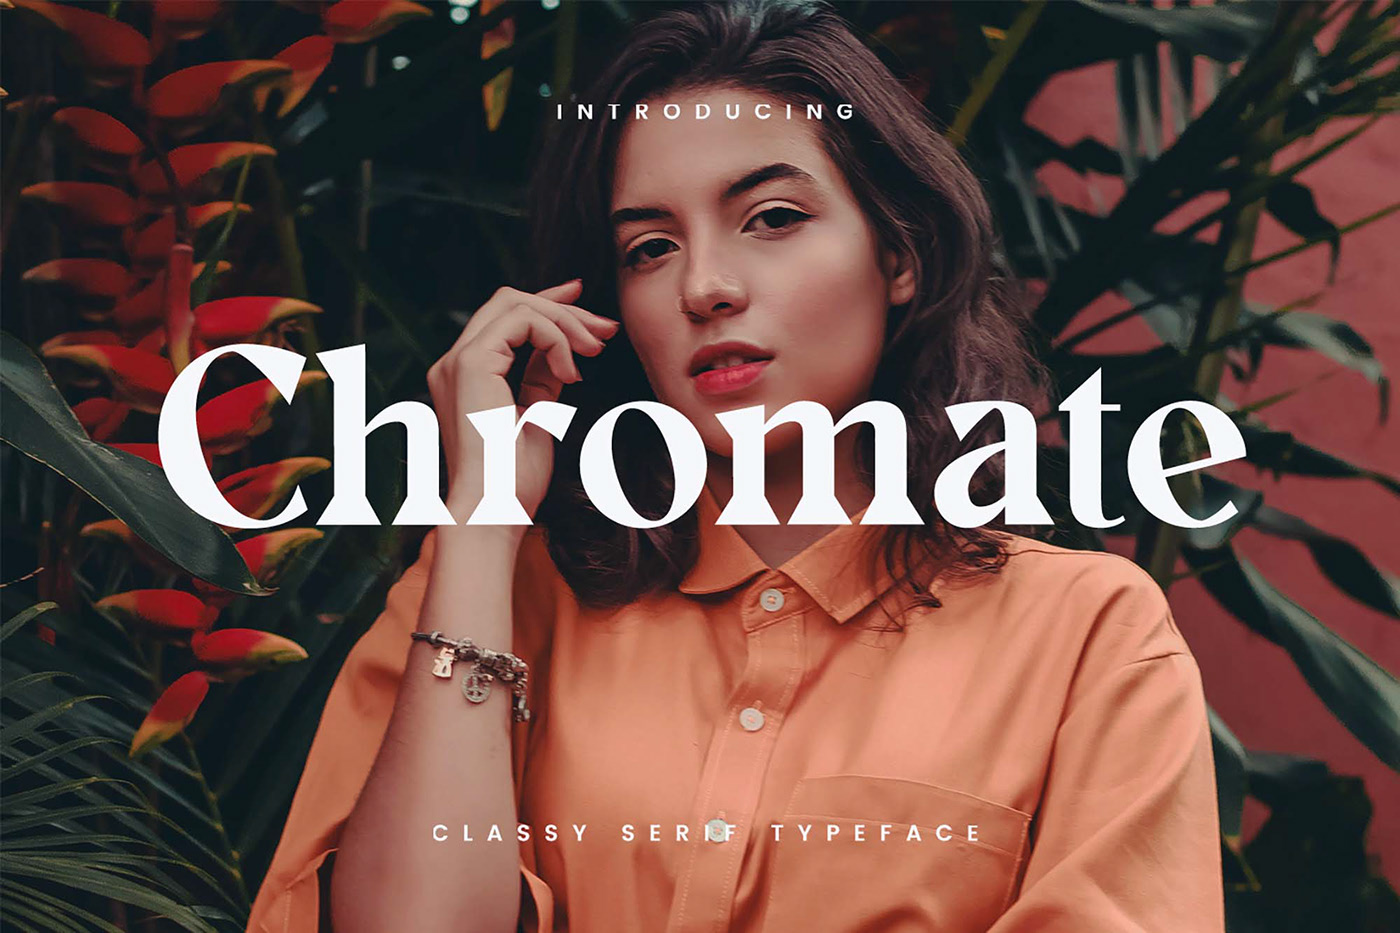 Chromate Free Font - serif